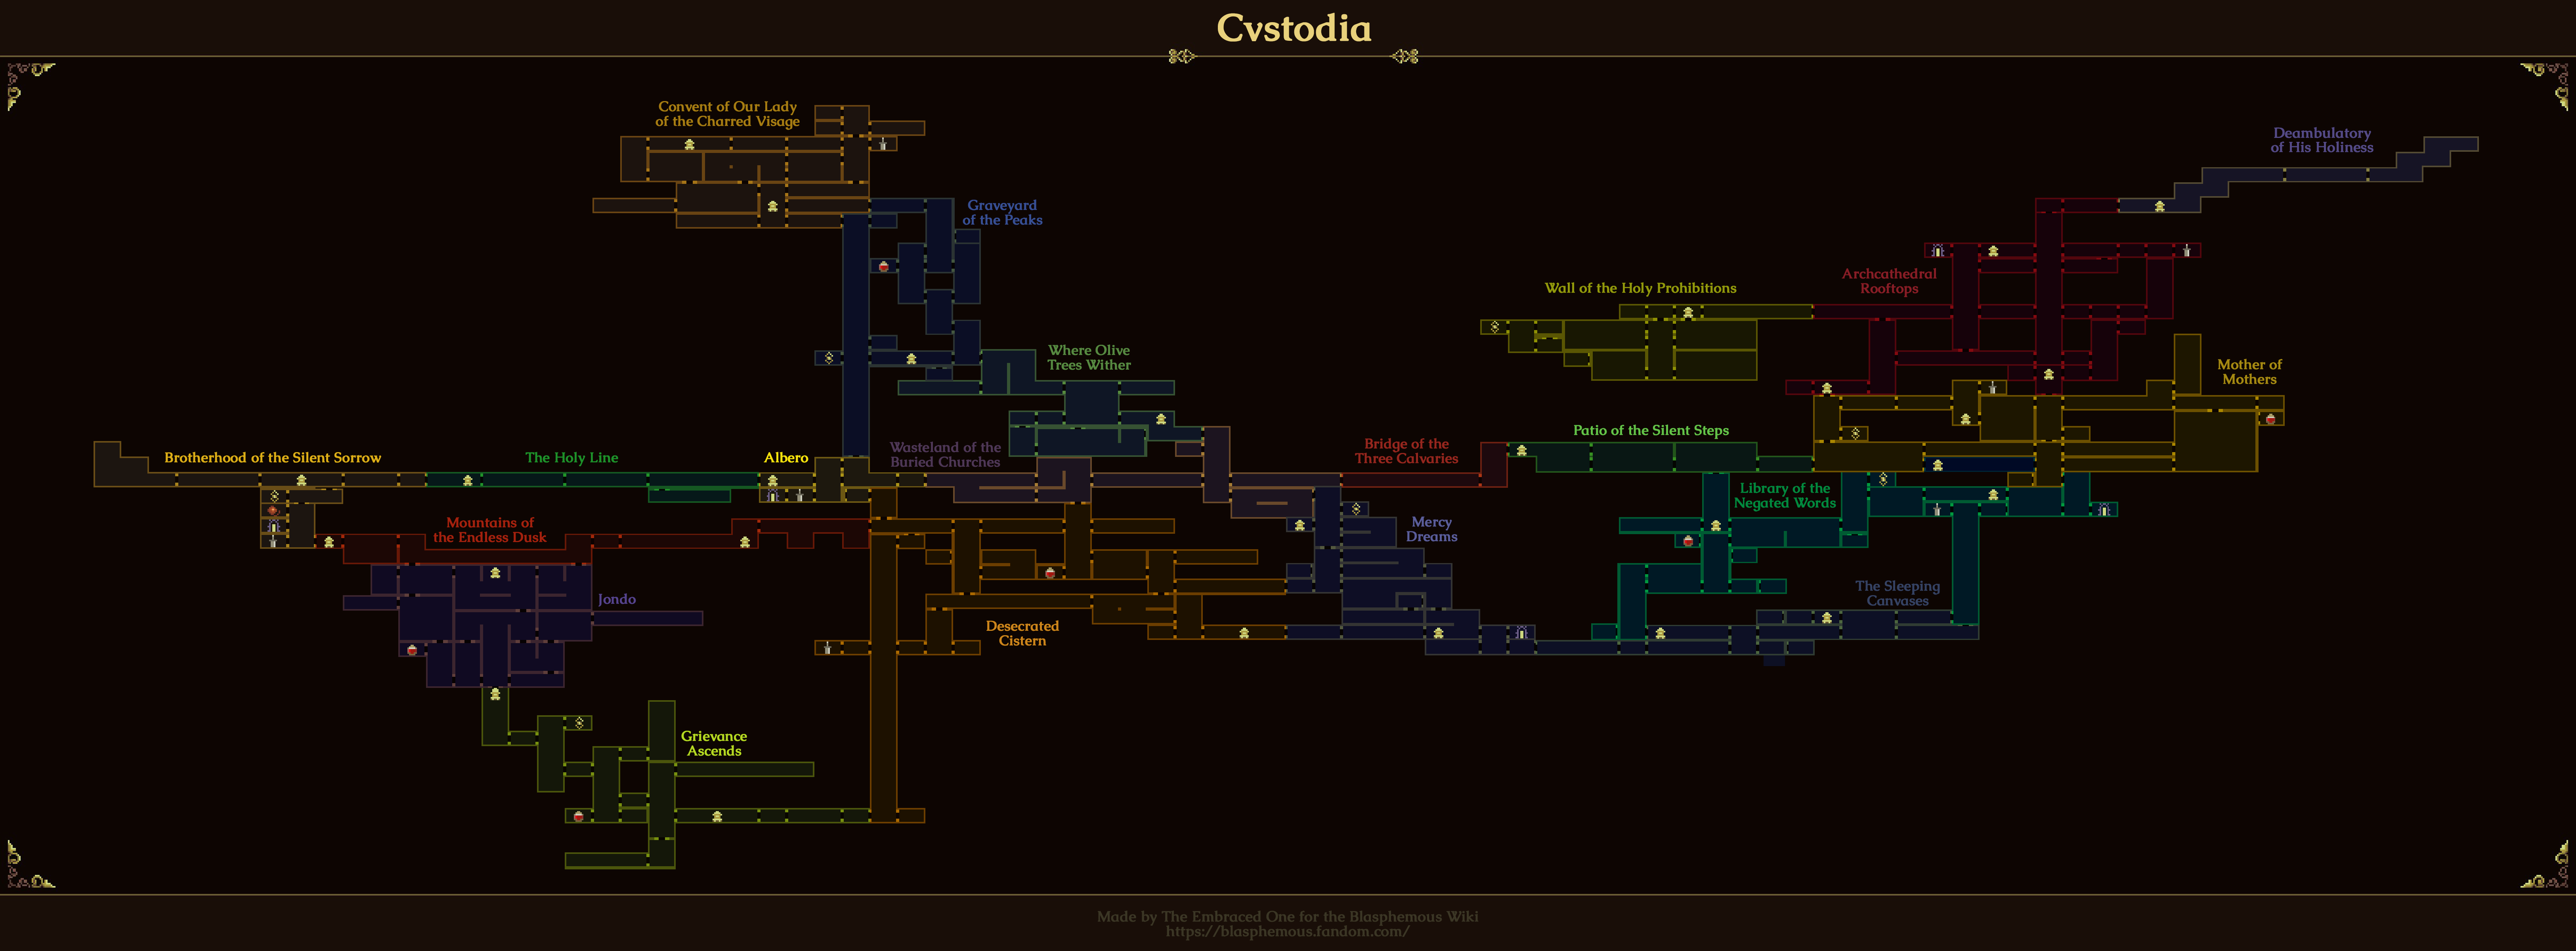 Map Cvstodia.png